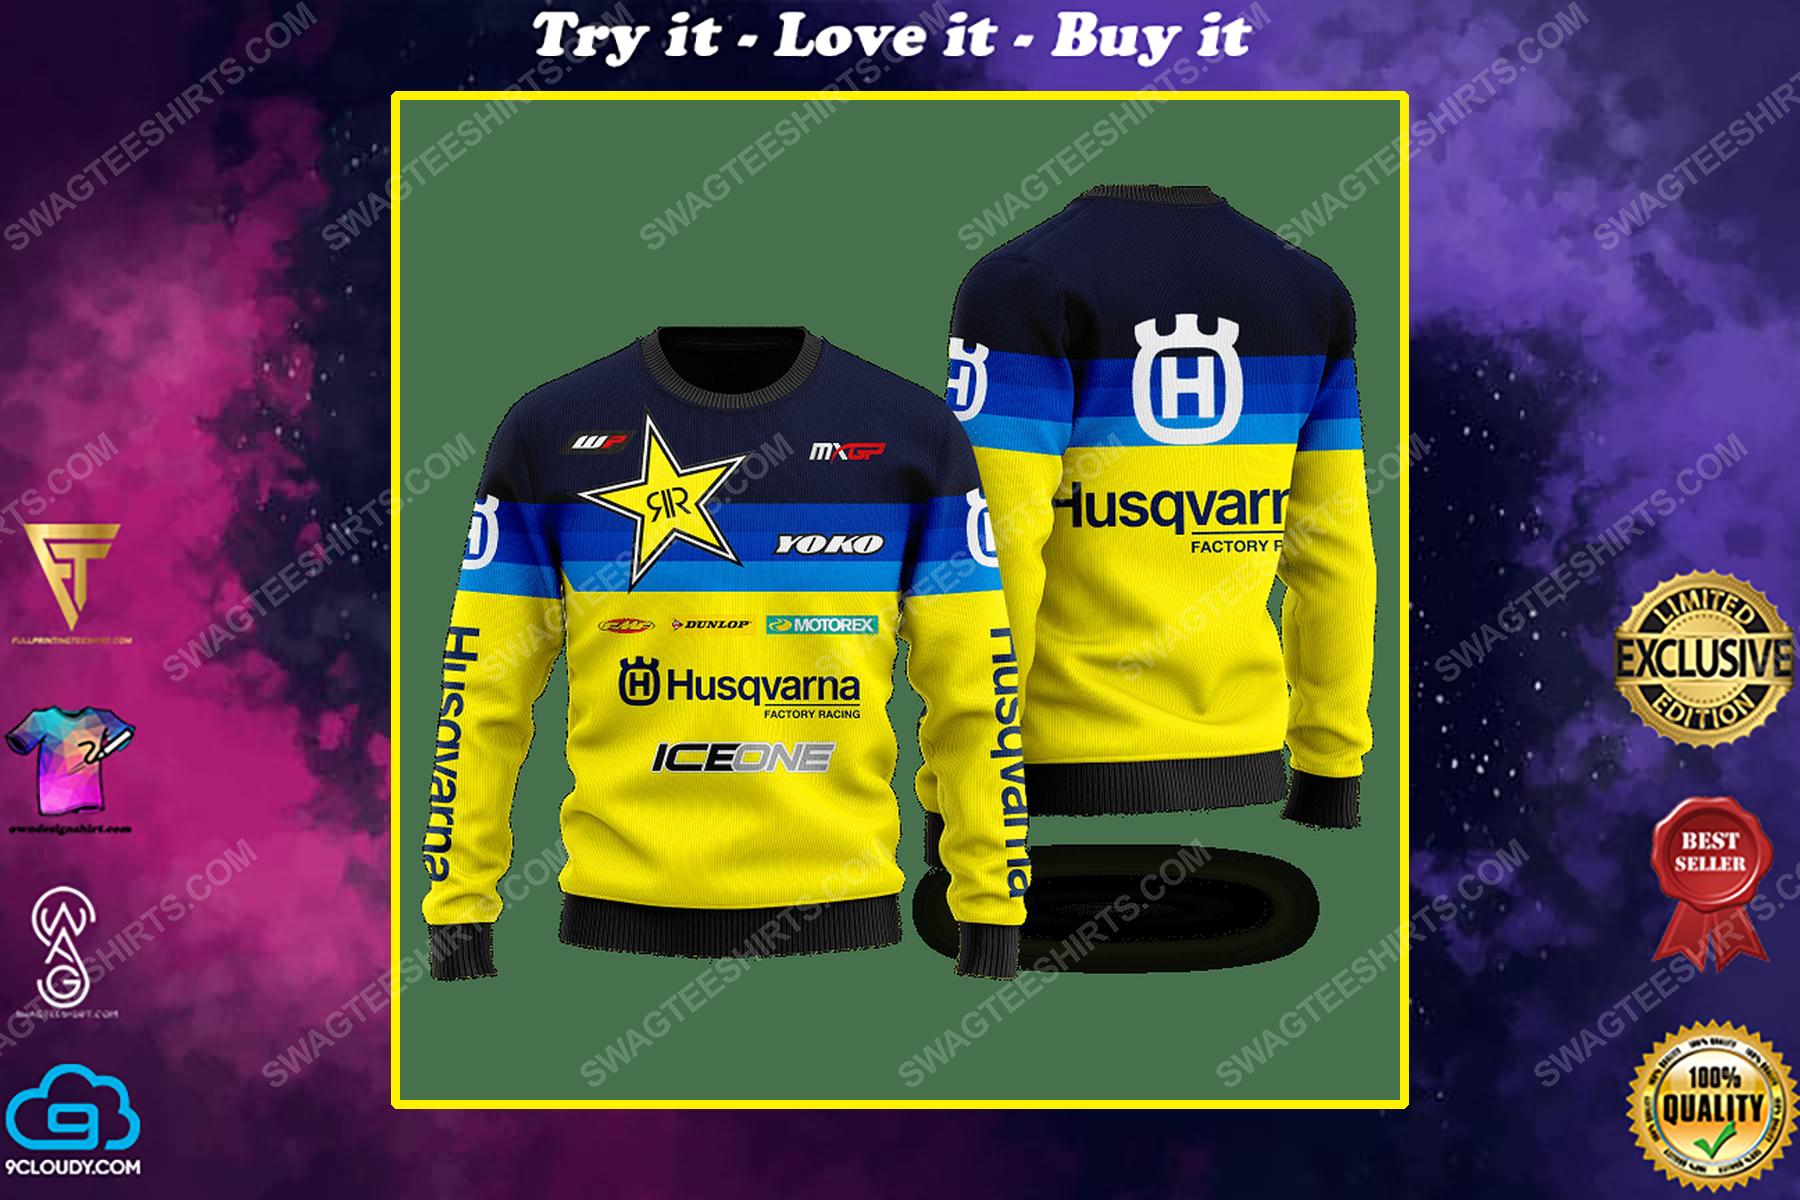 Husqvarna factory racing ugly christmas sweater 1